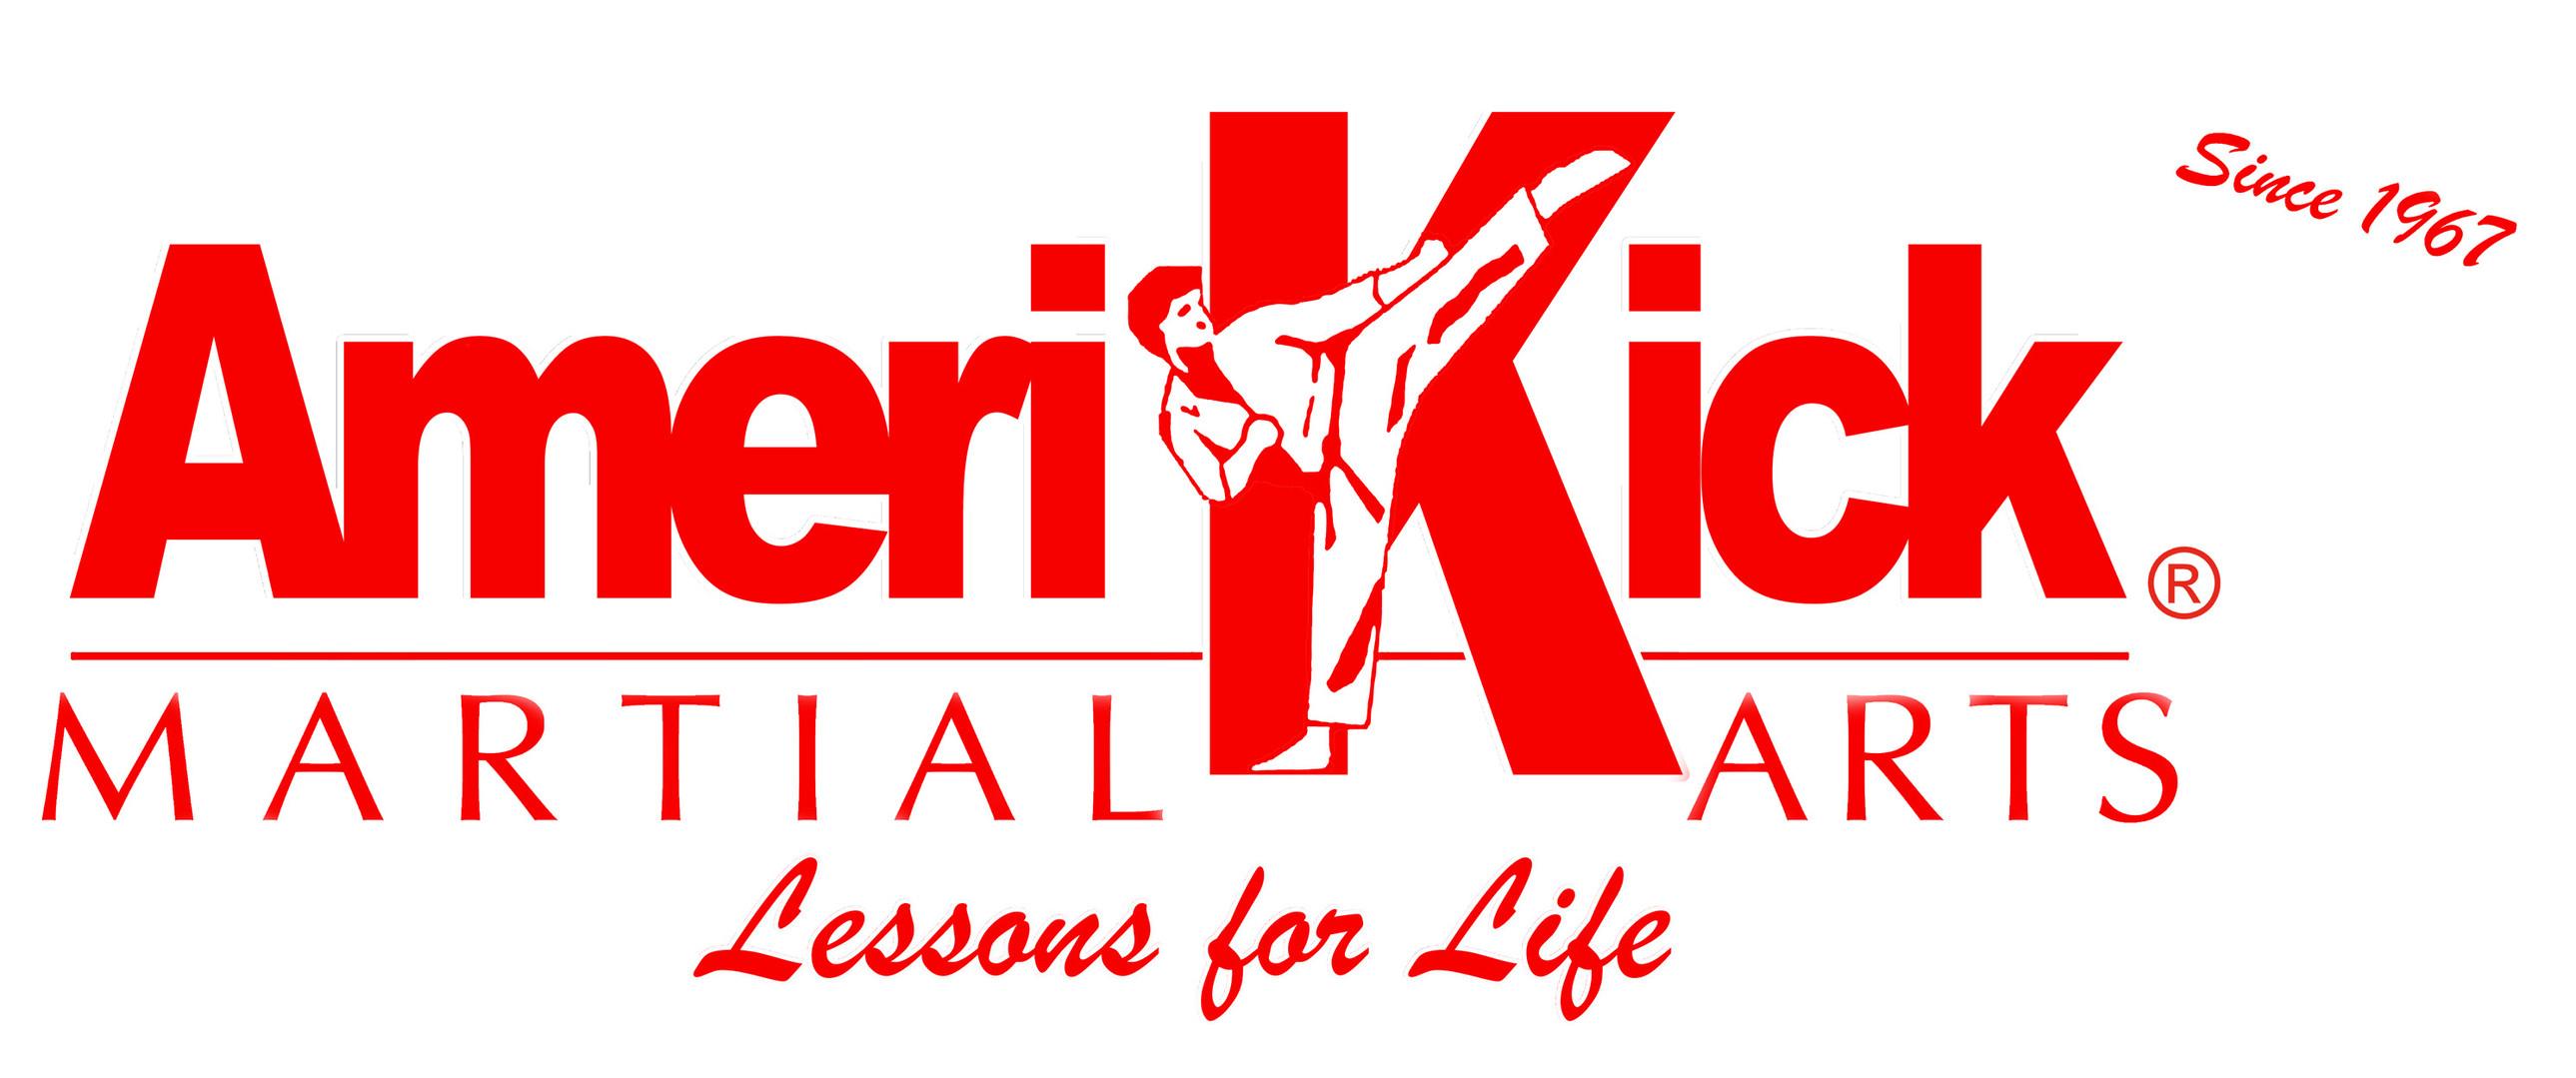 logo-2013amerikick_red_12inch.jpg